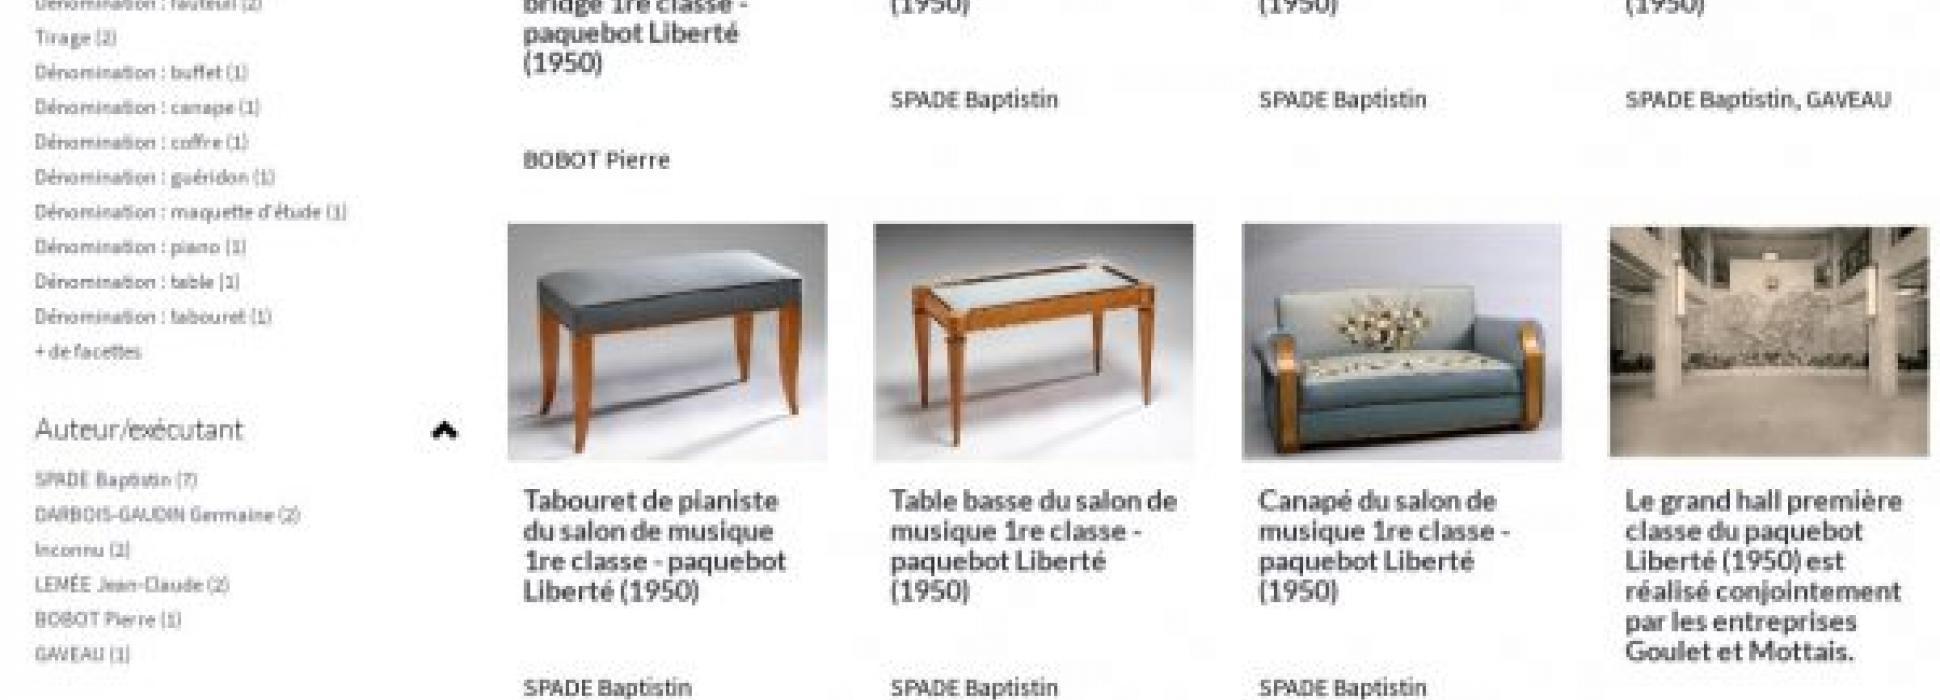 Saint-Nazaire Agglomération Tourisme dedicates a new website to the heritage of the Ecomuseum of Saint-Nazaire